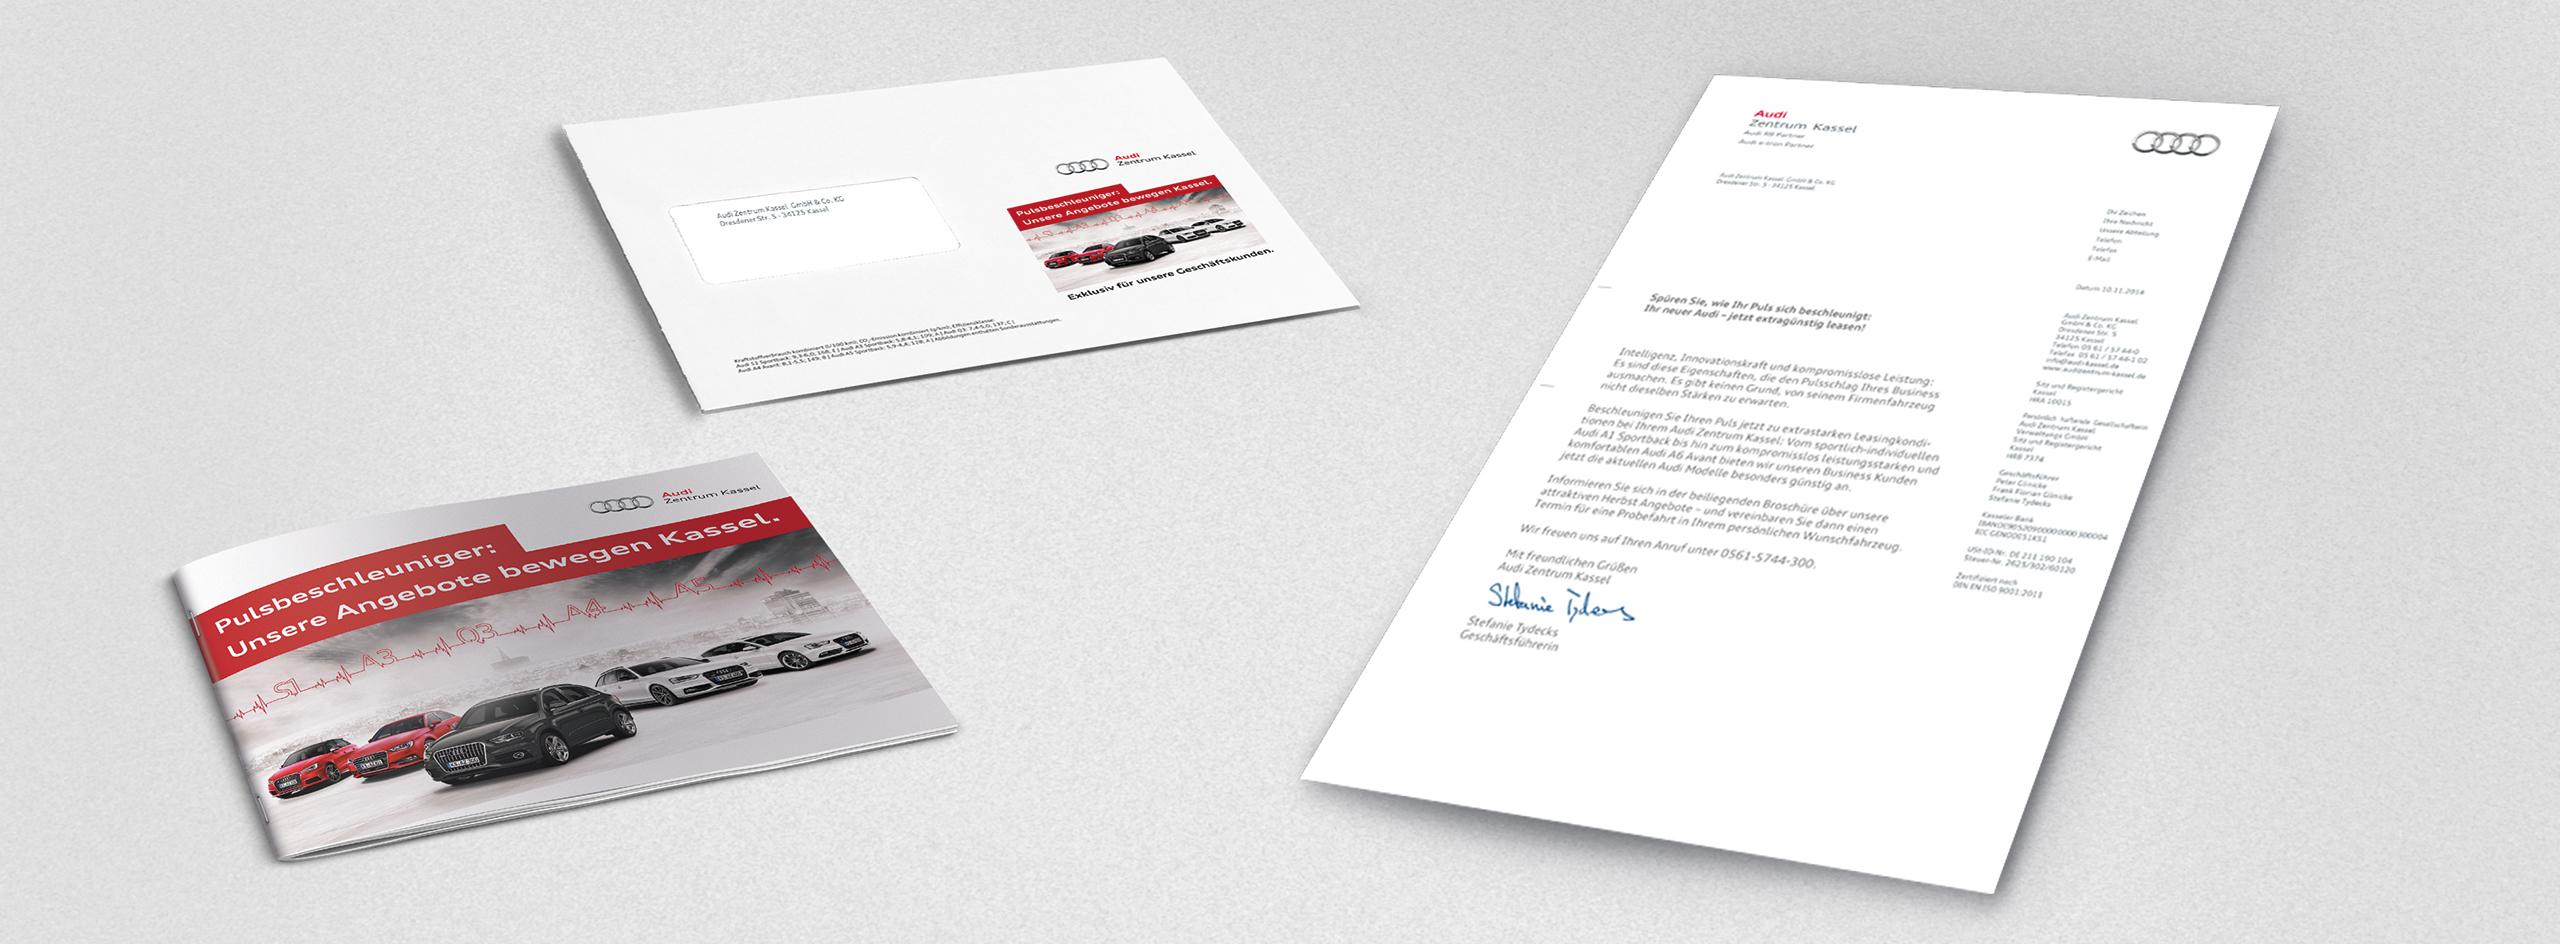 intonic werbeagentur audizentrum kassel kampagne mailing